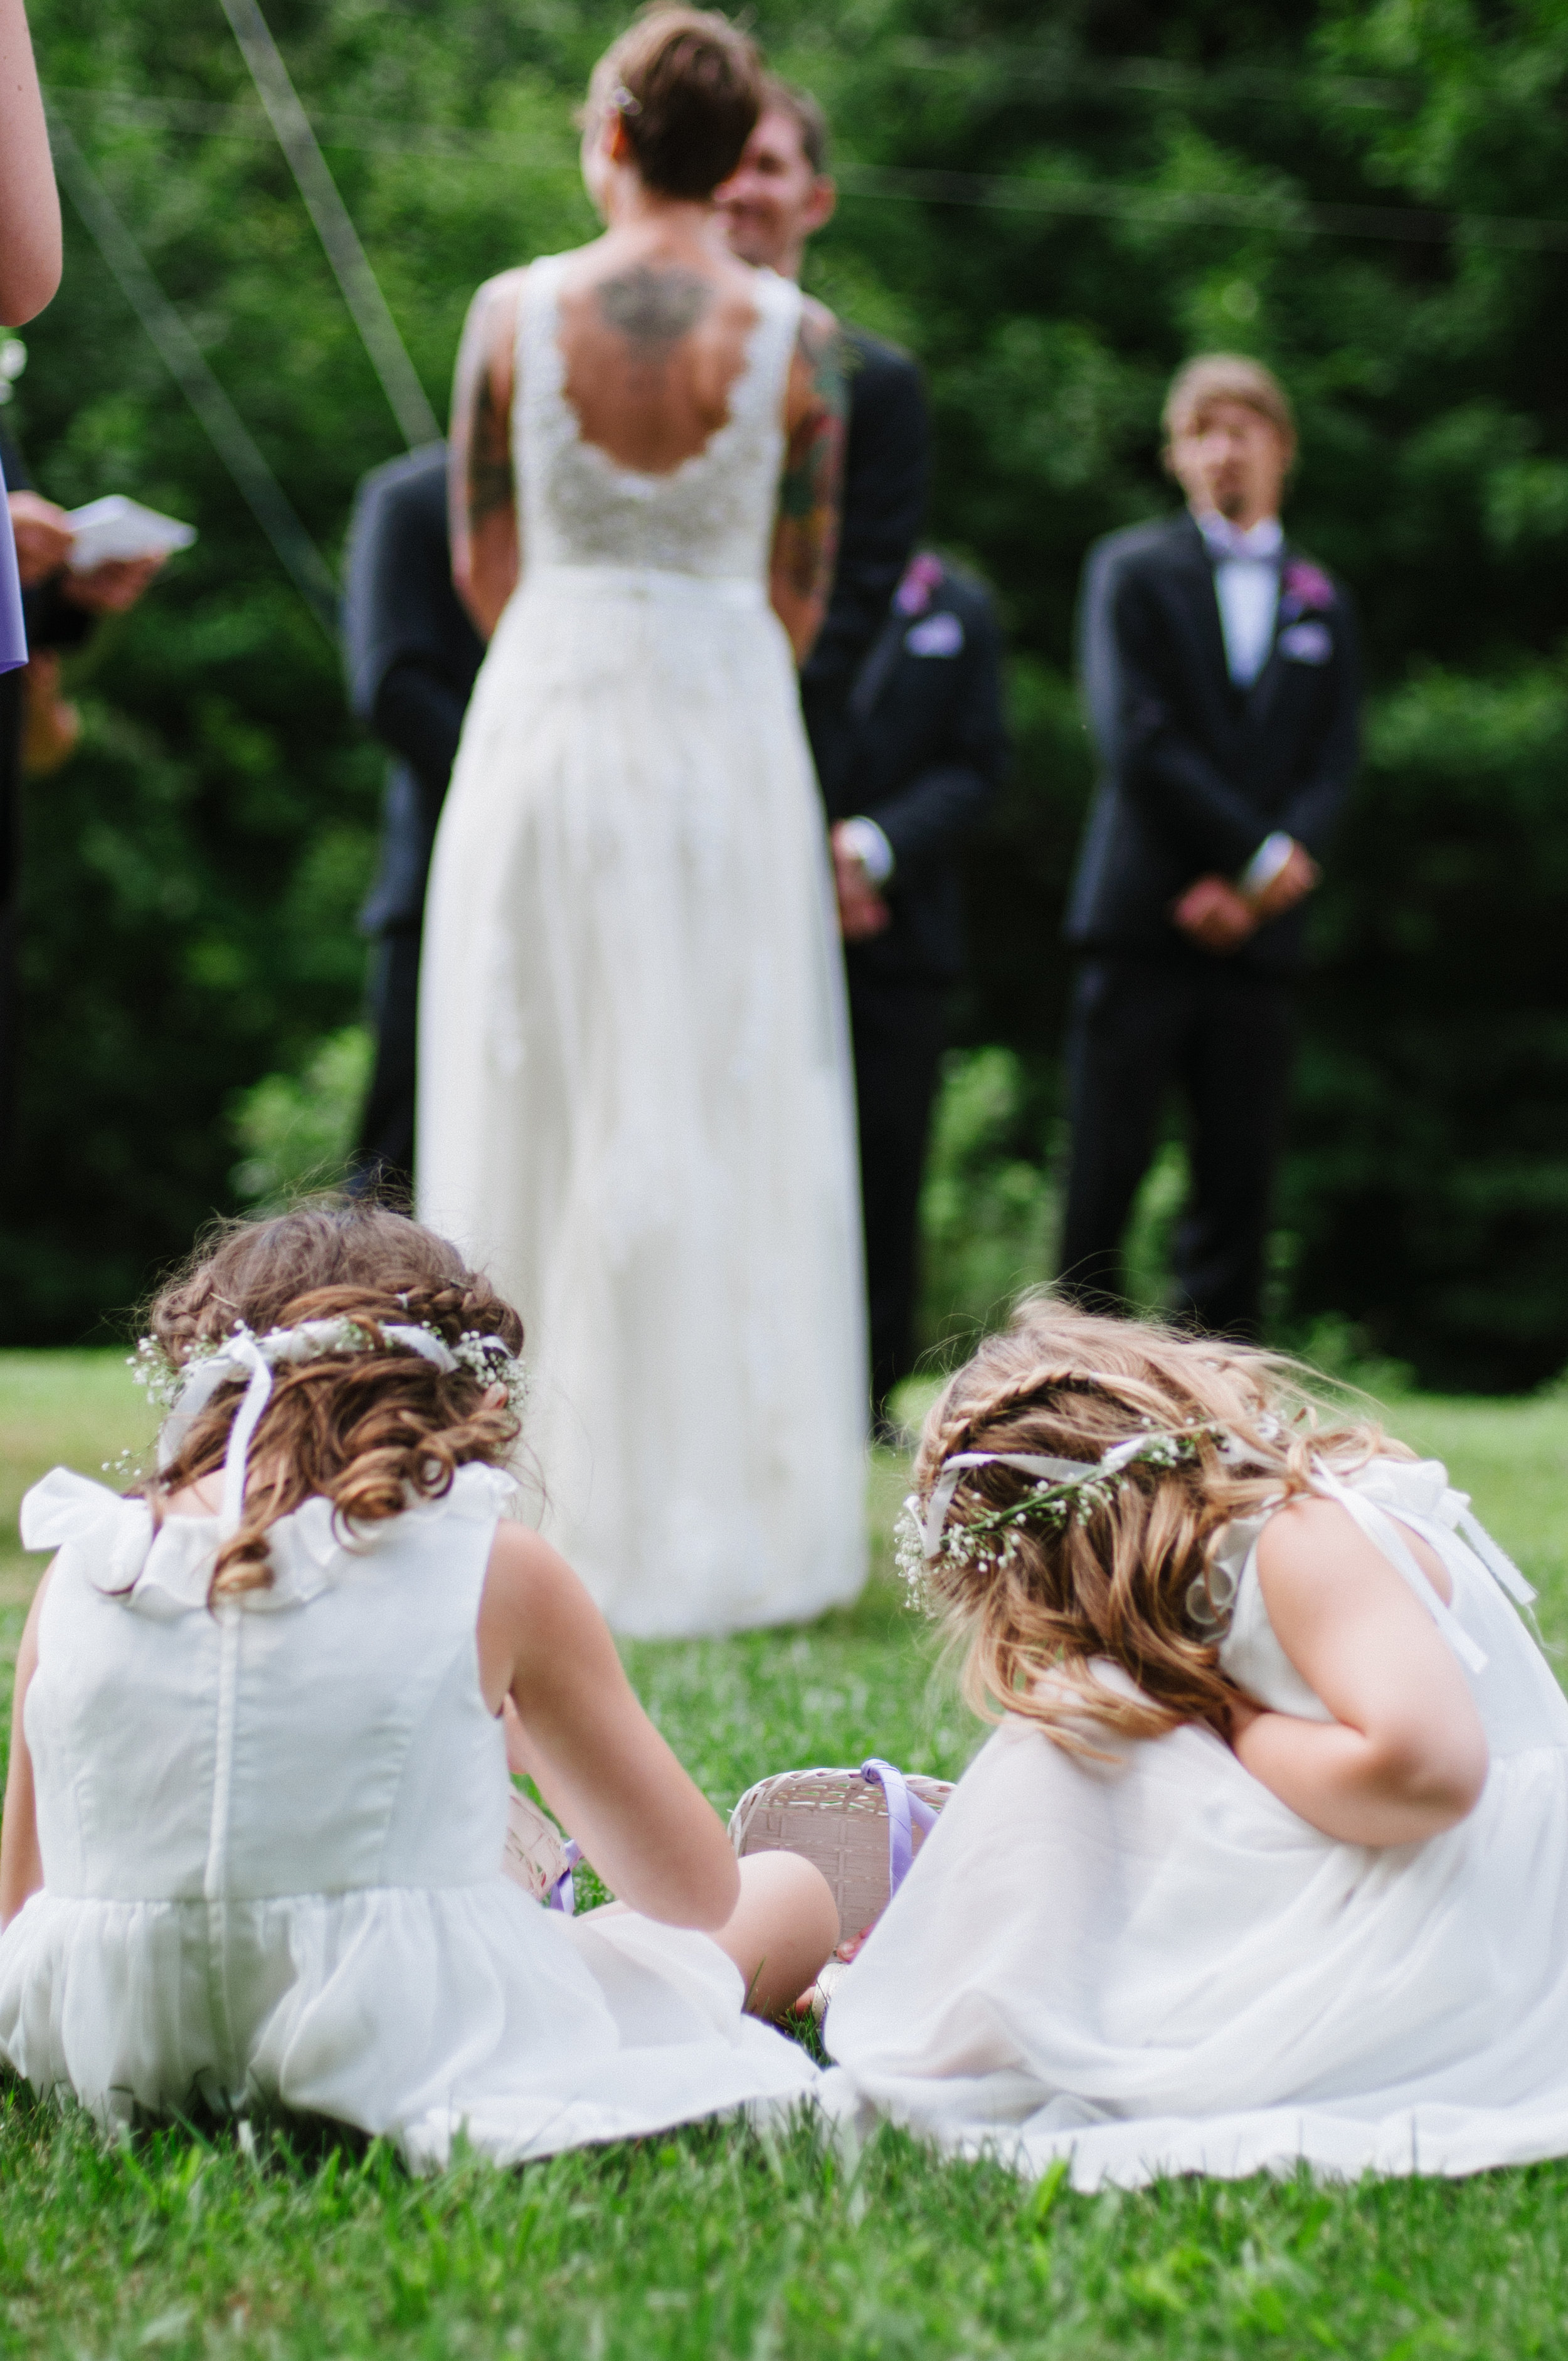 NH-Wedding-2015-6.jpg